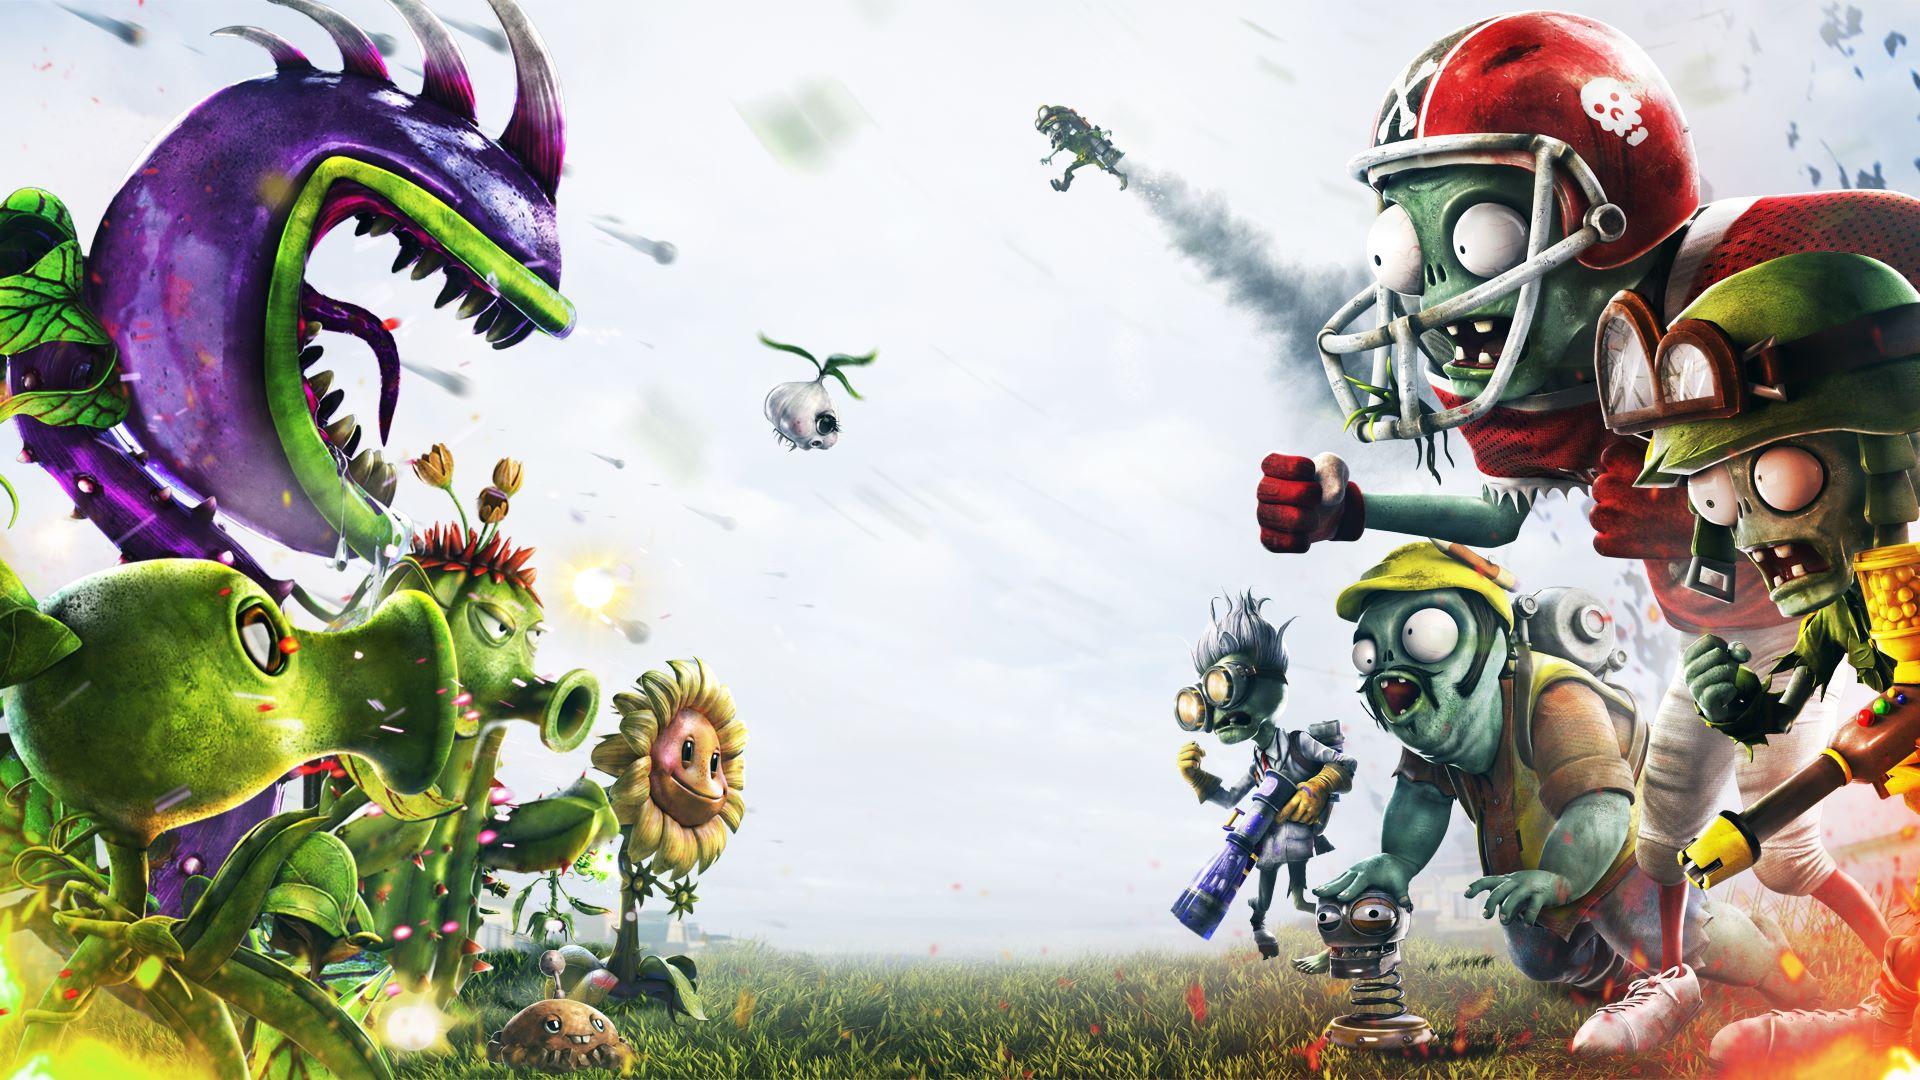 Cover art for the original Plants vs. Zombies: Garden Warfare